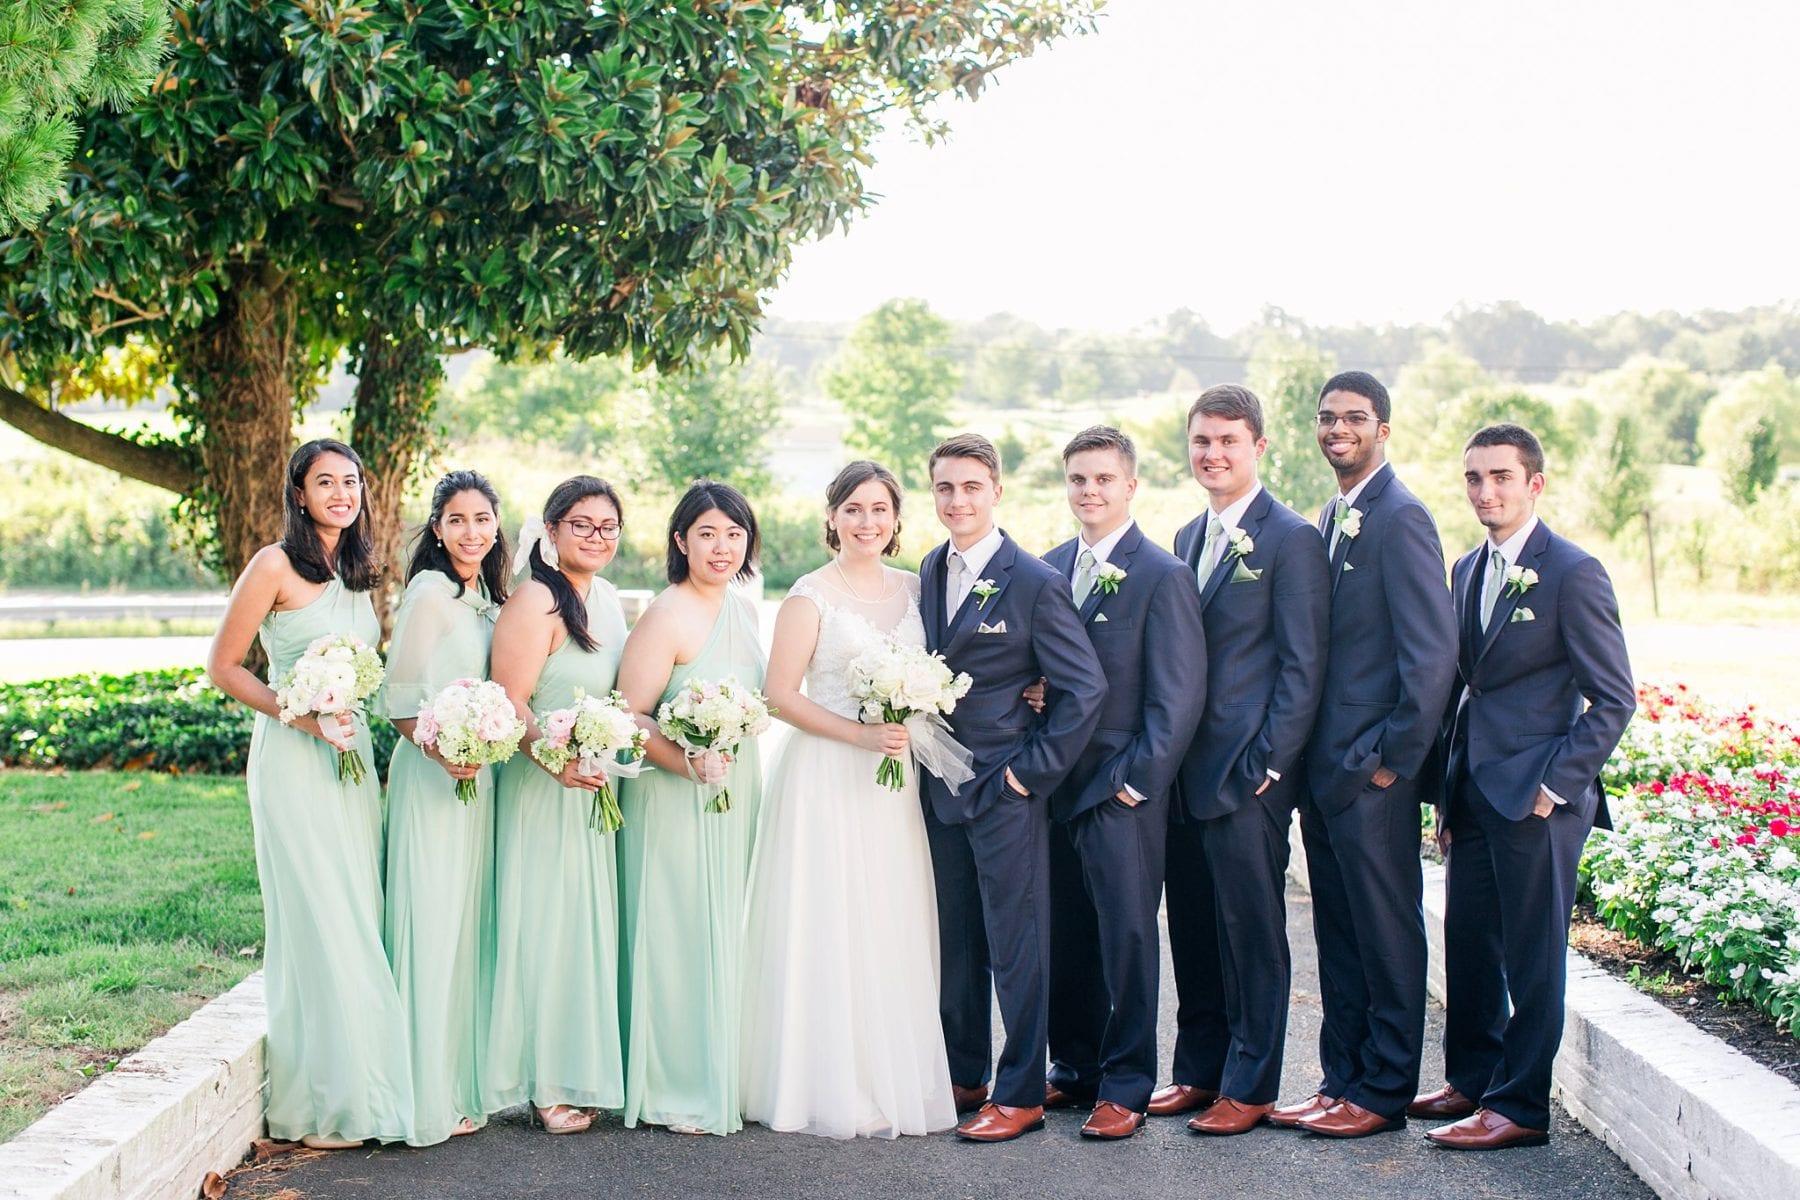 Bristow Manor Wedding Photos Virginia Wedding Photographer Lauren & Andrew Megan Kelsey Photography-428.jpg